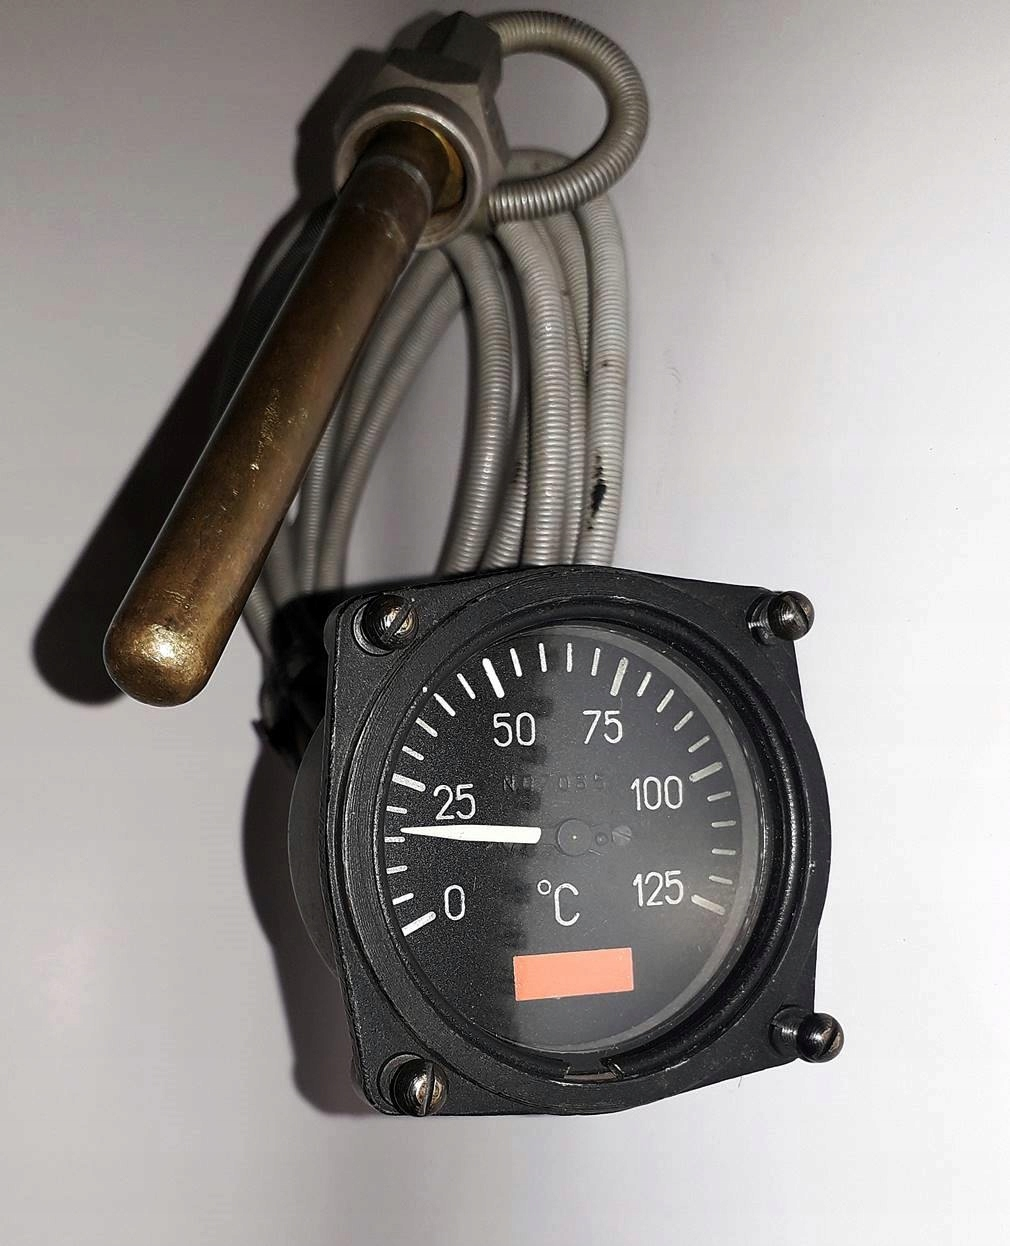 Termometr lotniczy, z samolotu, BCM